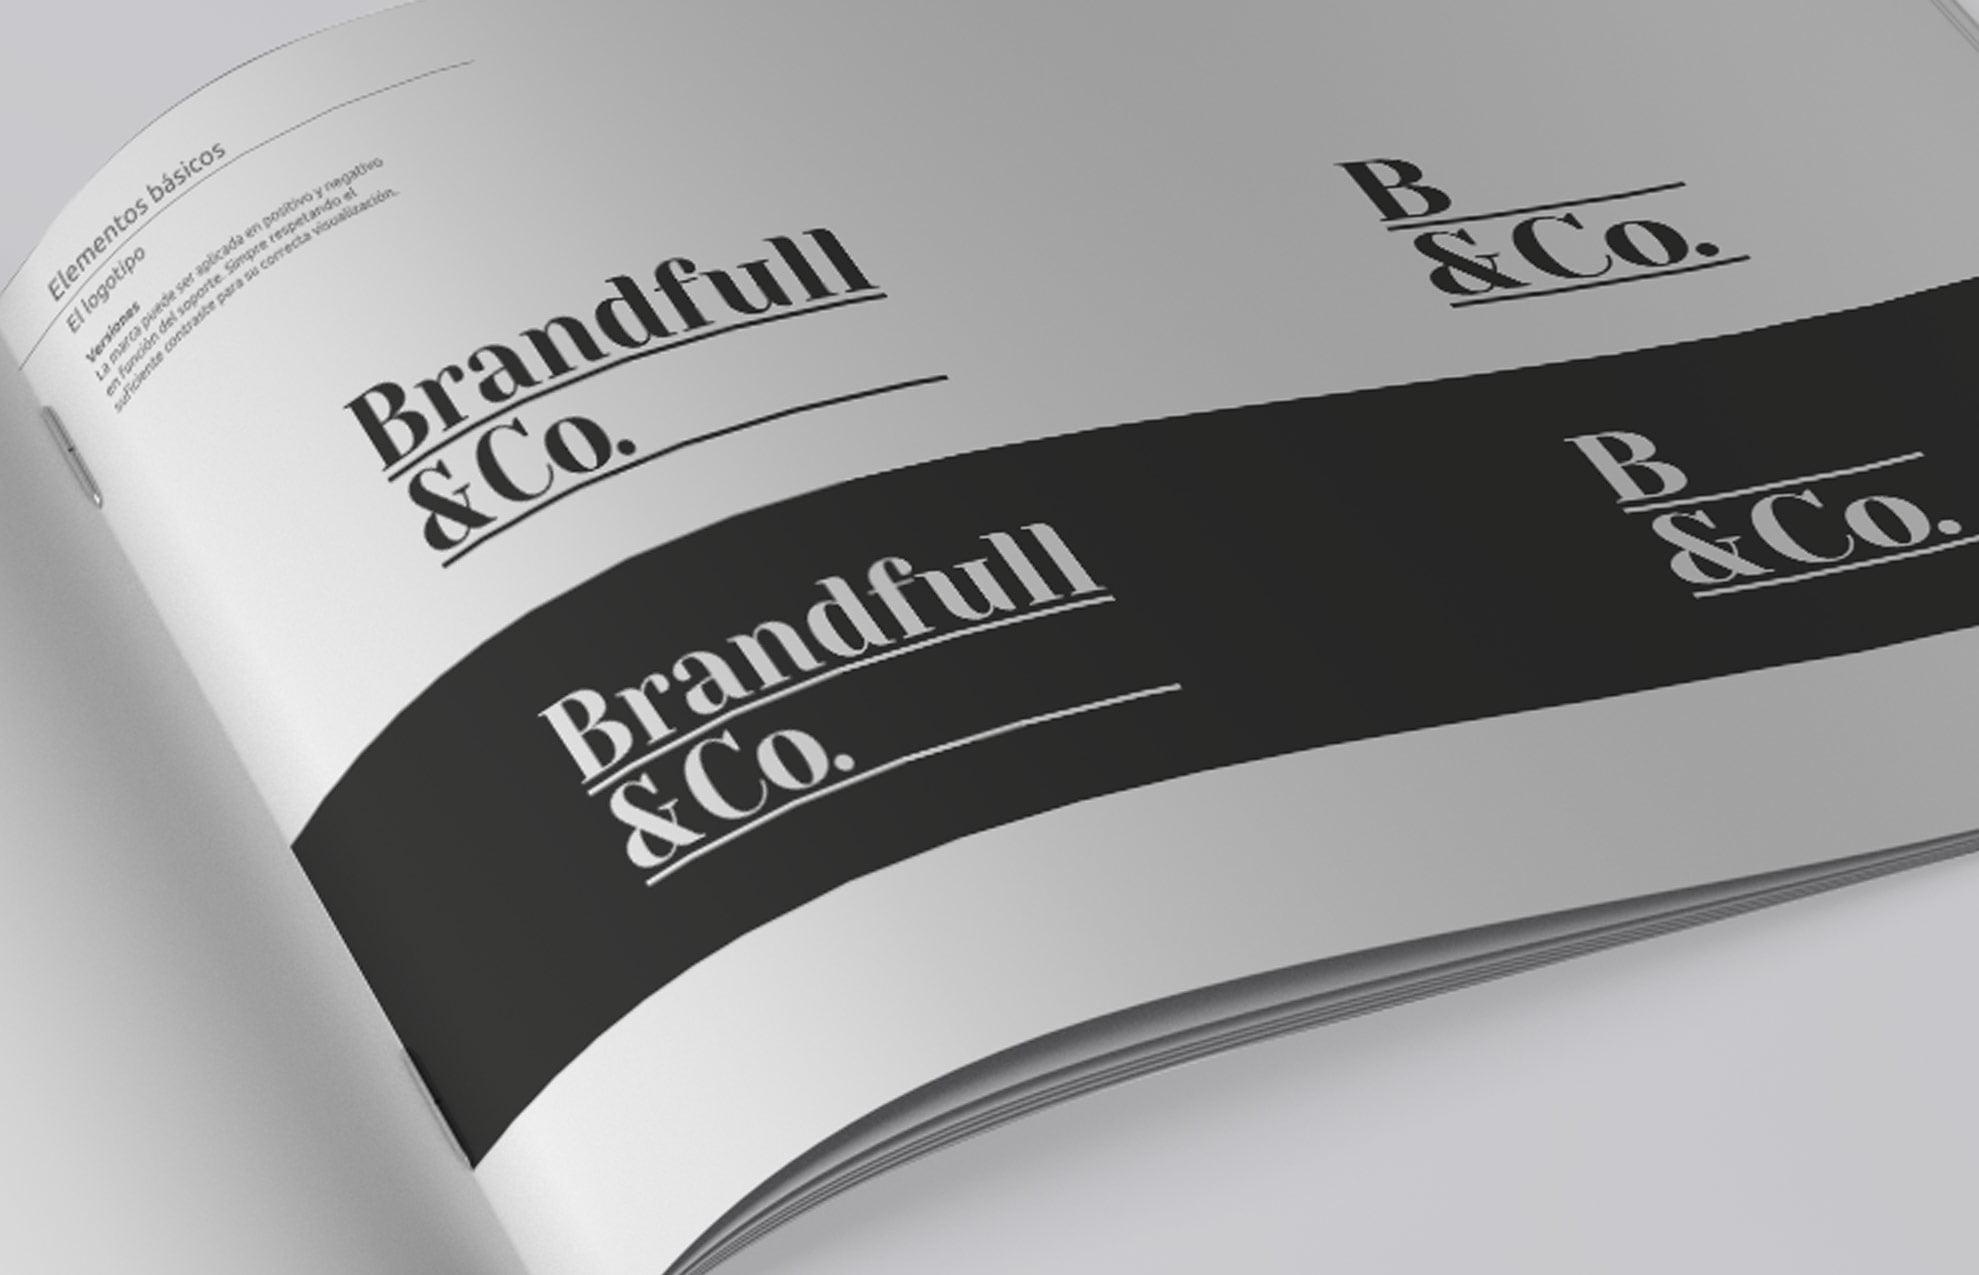 libro de identidad grafica corporativa barcelona - Manual de identidad corporativa: ¿por qué es tan importante?